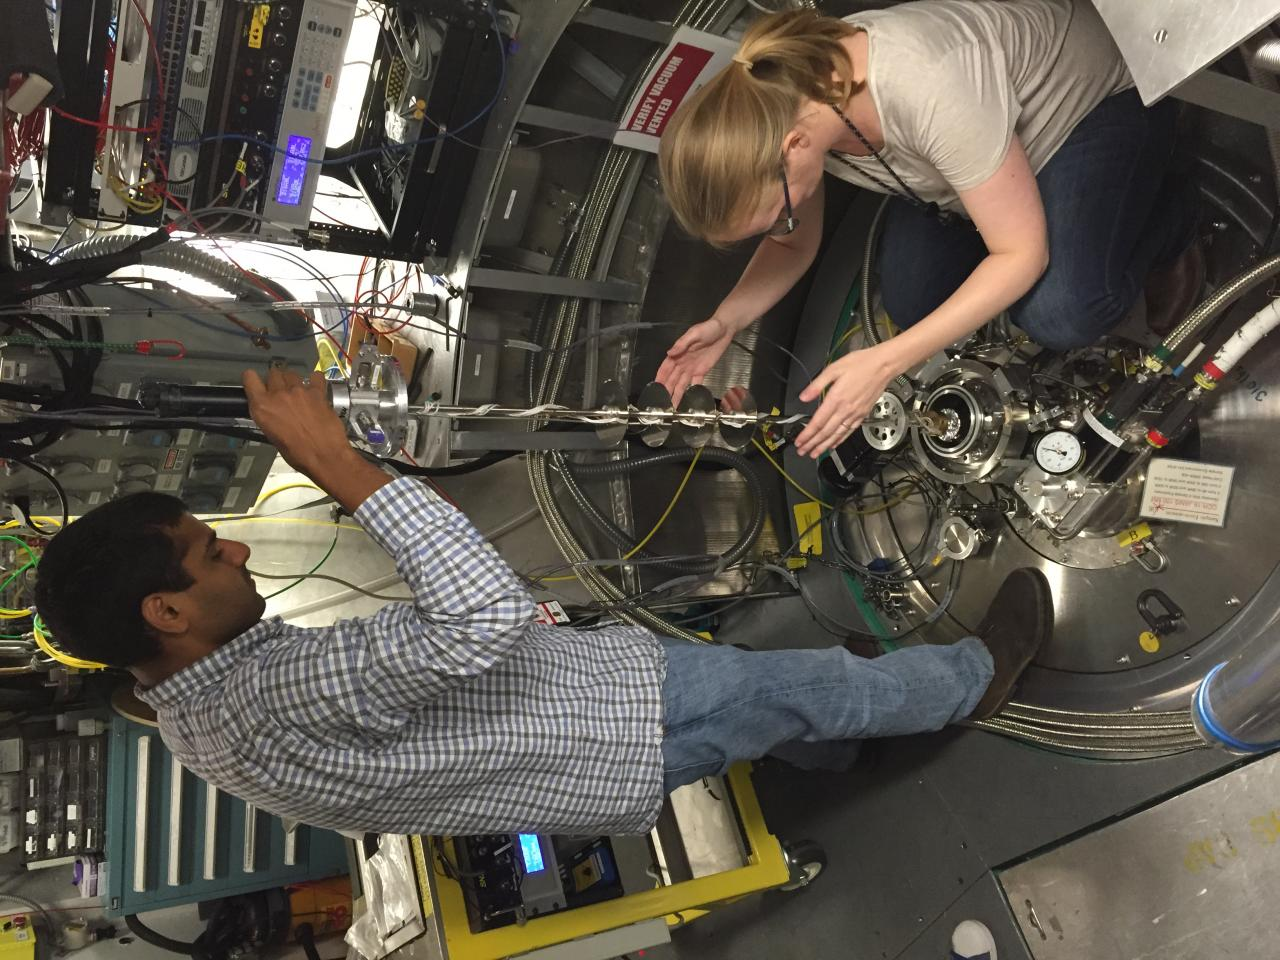 Loading sample into ARCS chamber.